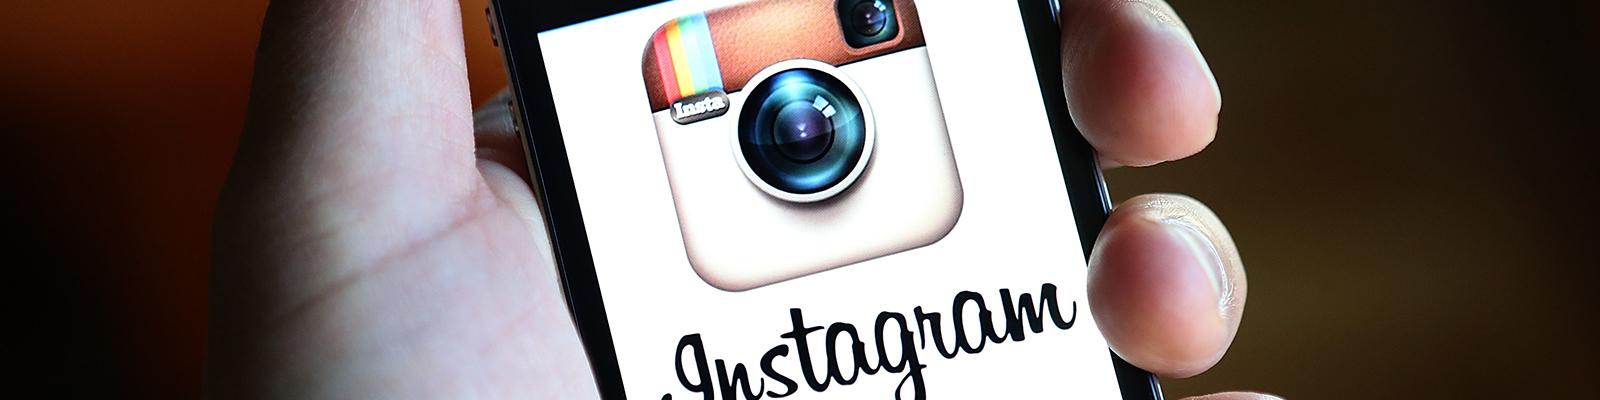 instagram clone cost